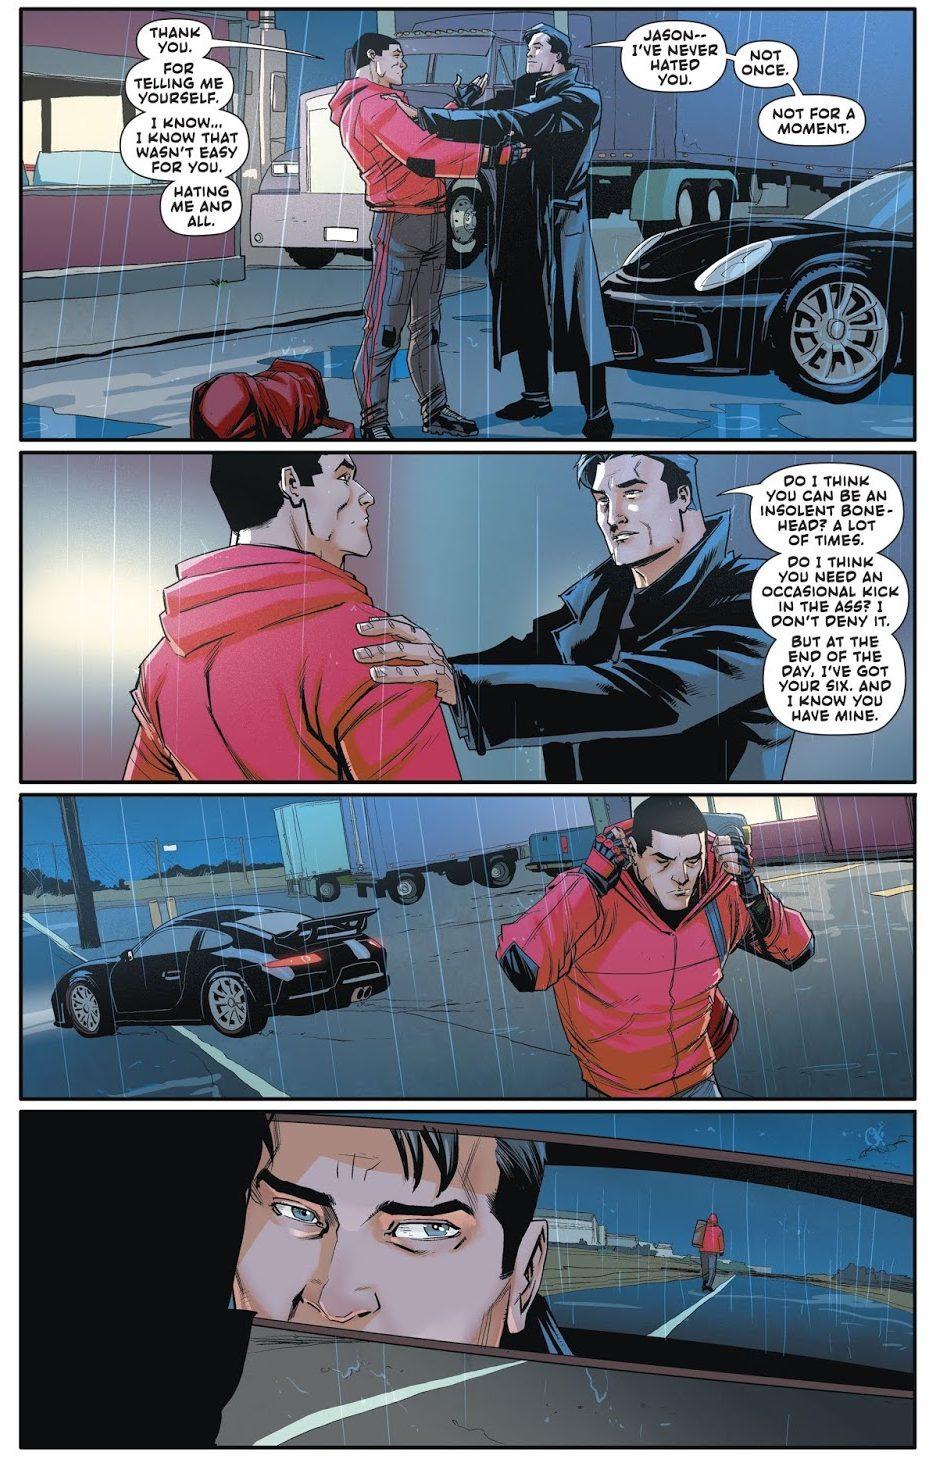 Bruce Wayne And Jason Todd Bury The Hatchet (Rebirth)